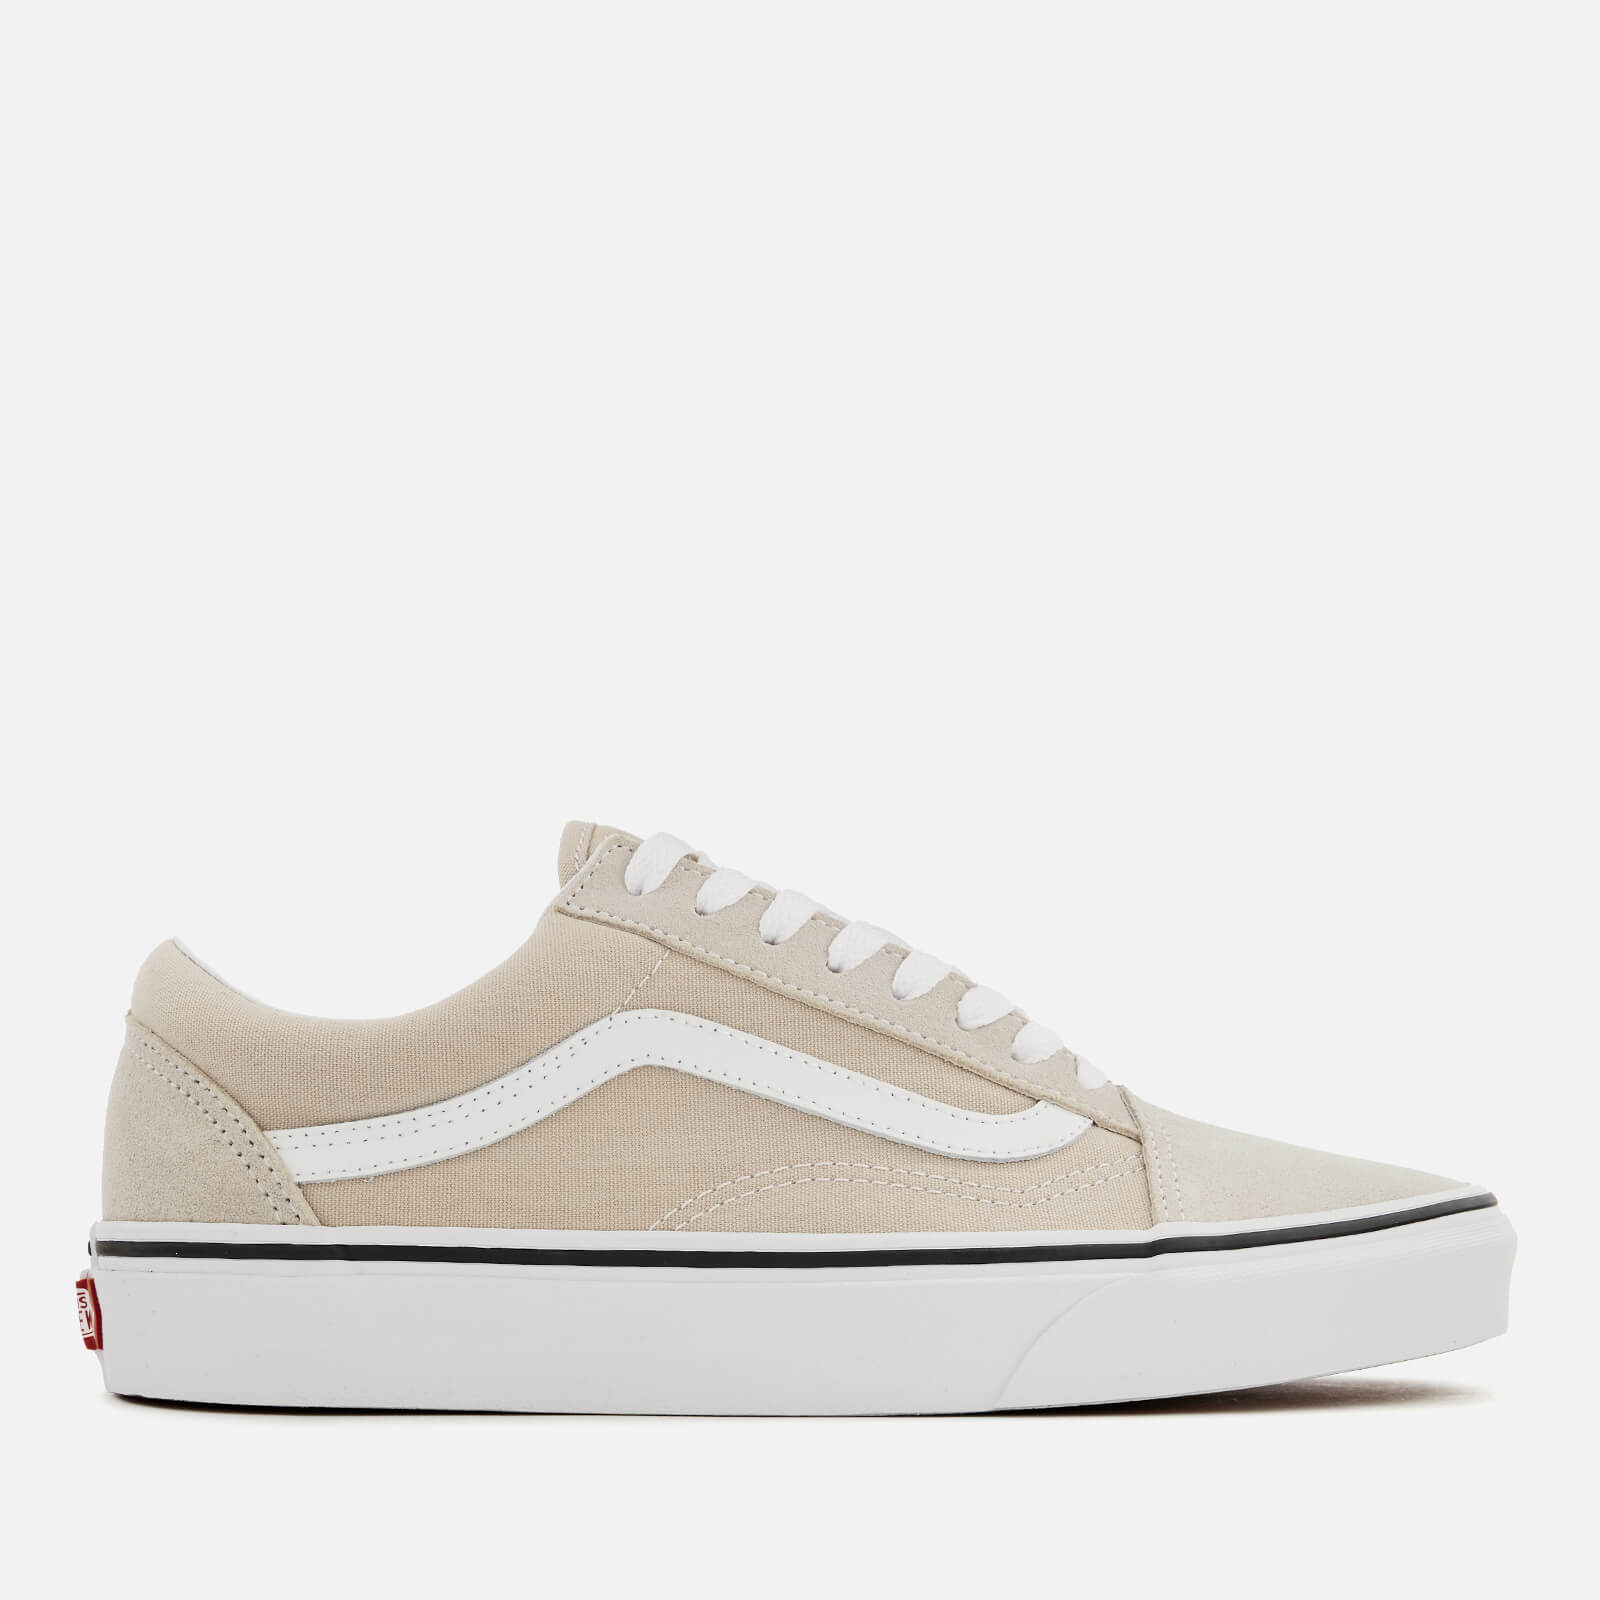 099d8f102a Vans Men s Old Skool Trainers - Silver Lining True White Mens Footwear